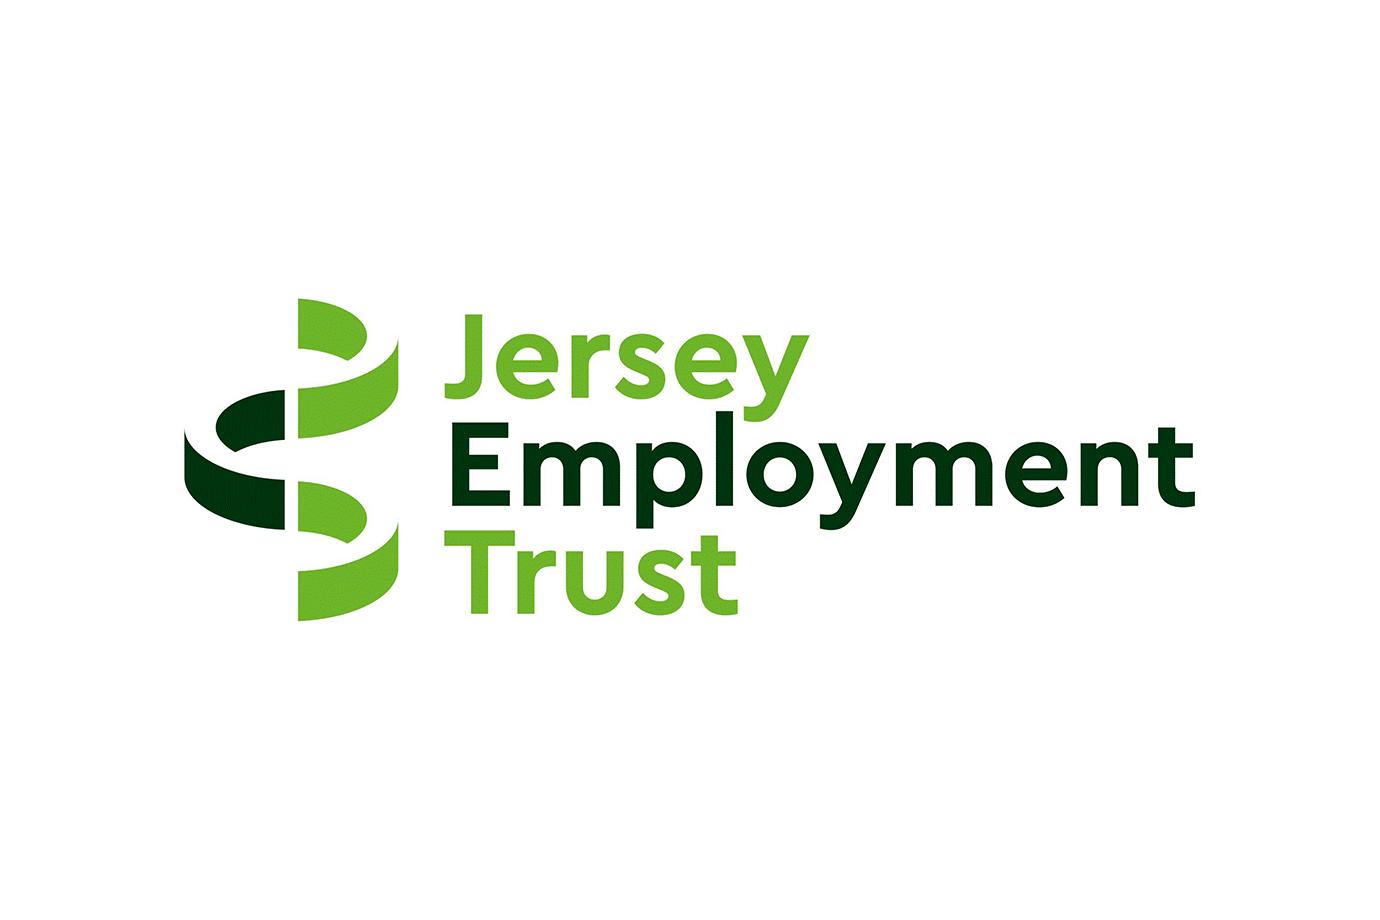 Jersey Employment Trust